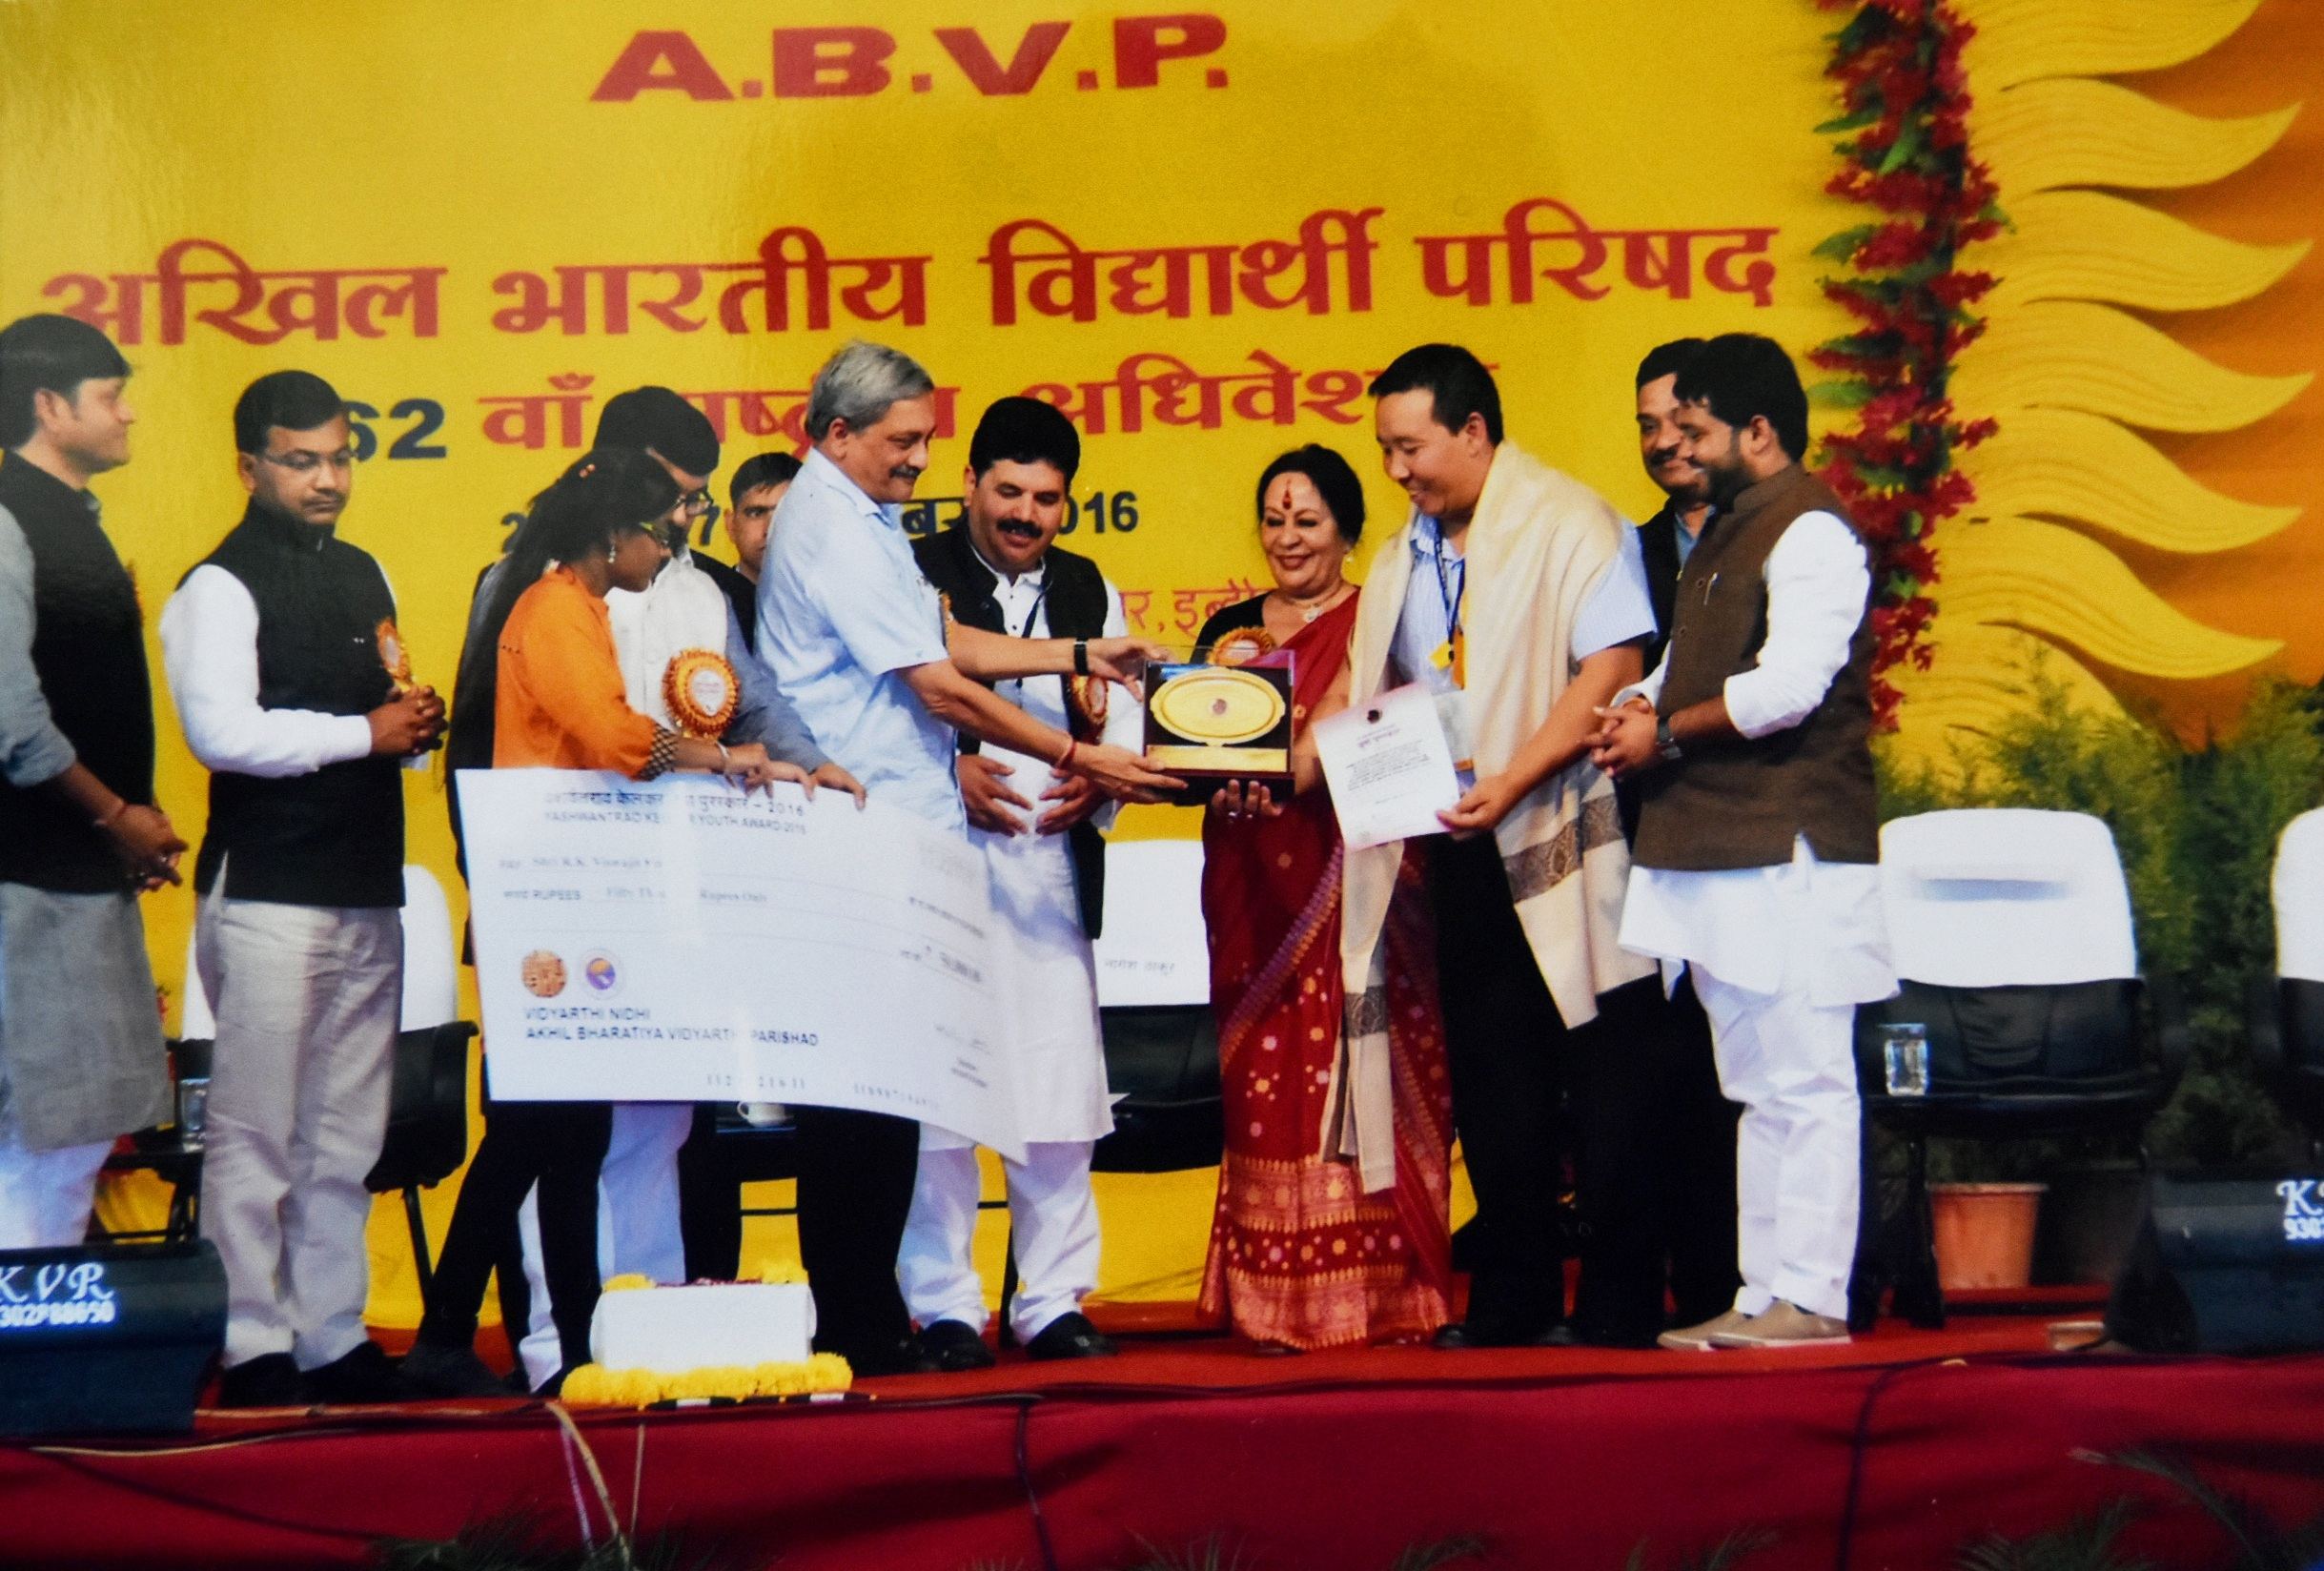 Prof Yaswantrao Kelkar award